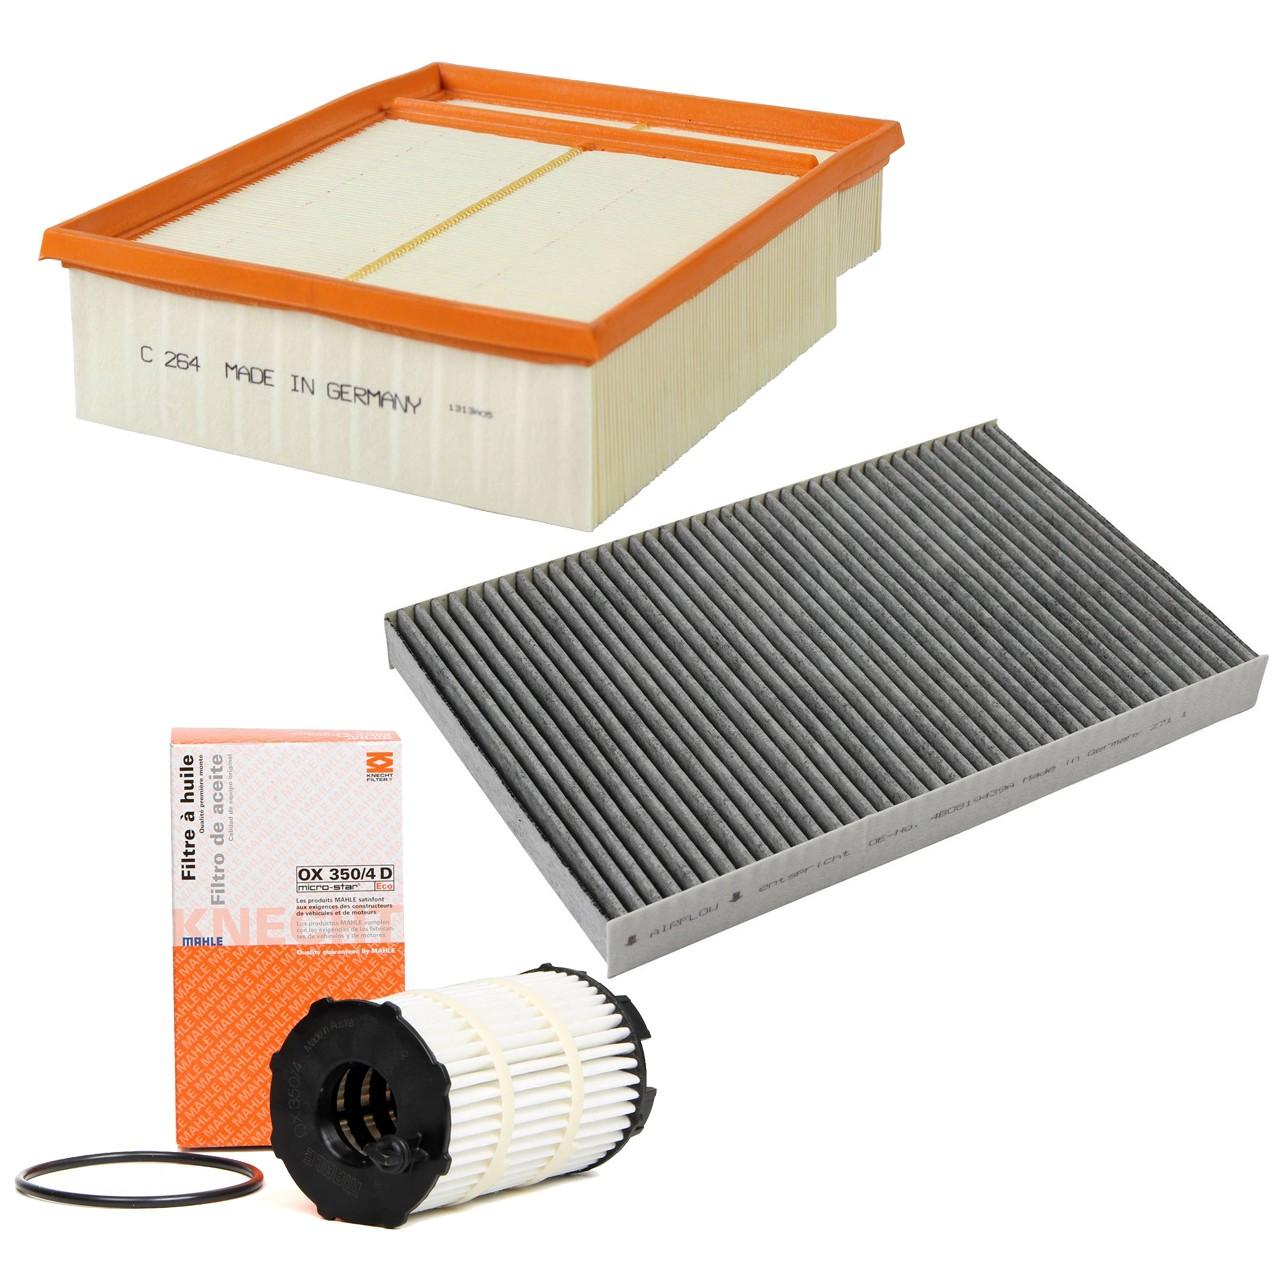 Inspektionskit Filterpaket Filterset für Audi A4 (8E B7) RS4 quattro 420 PS